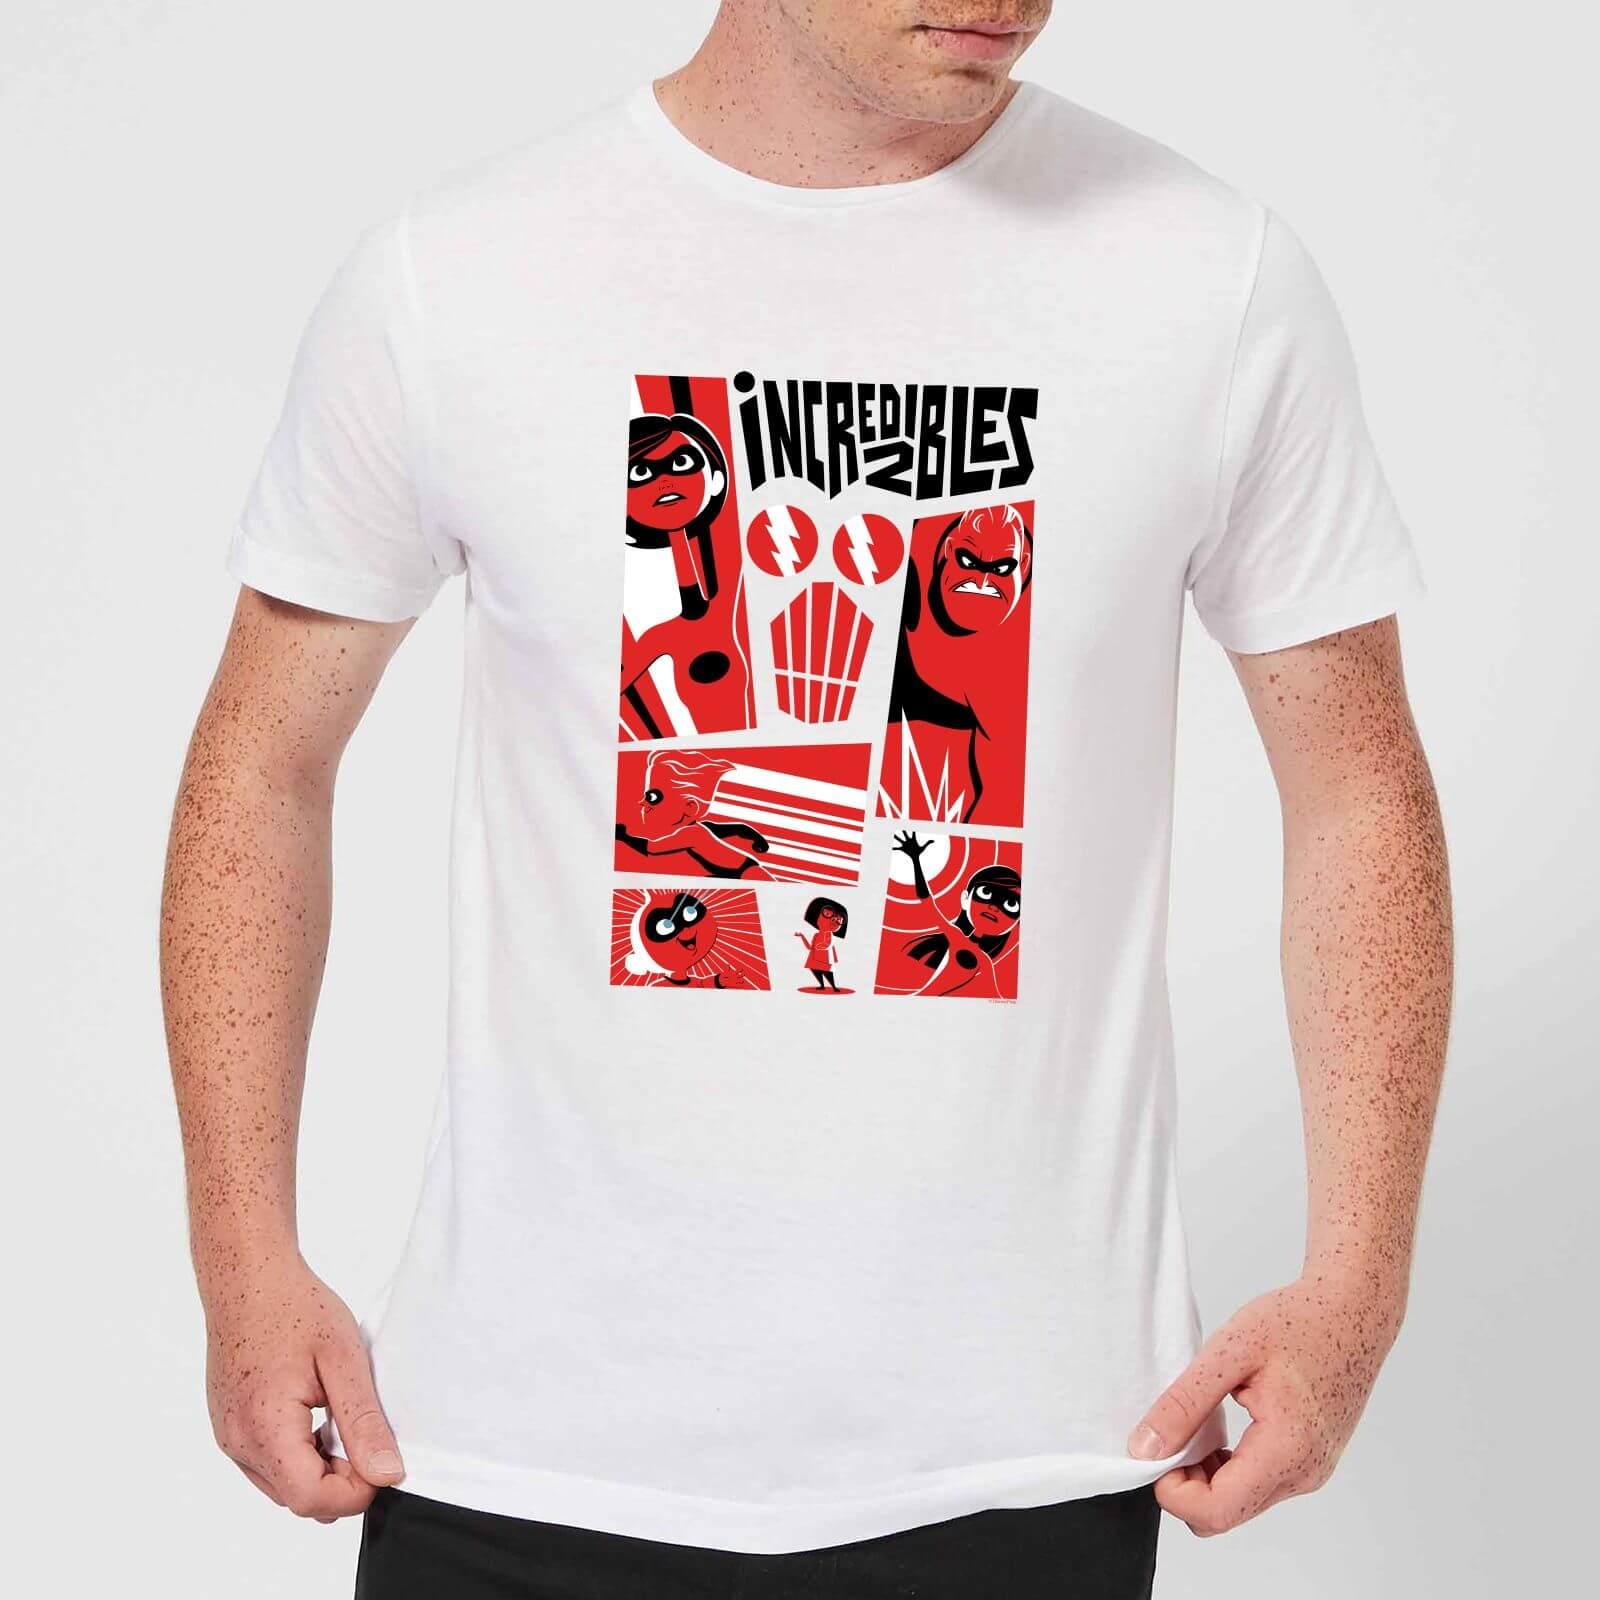 Box In WhitePop Poster A Shirt Uk 2 Incredibles T The Men's 1TlcFKJ